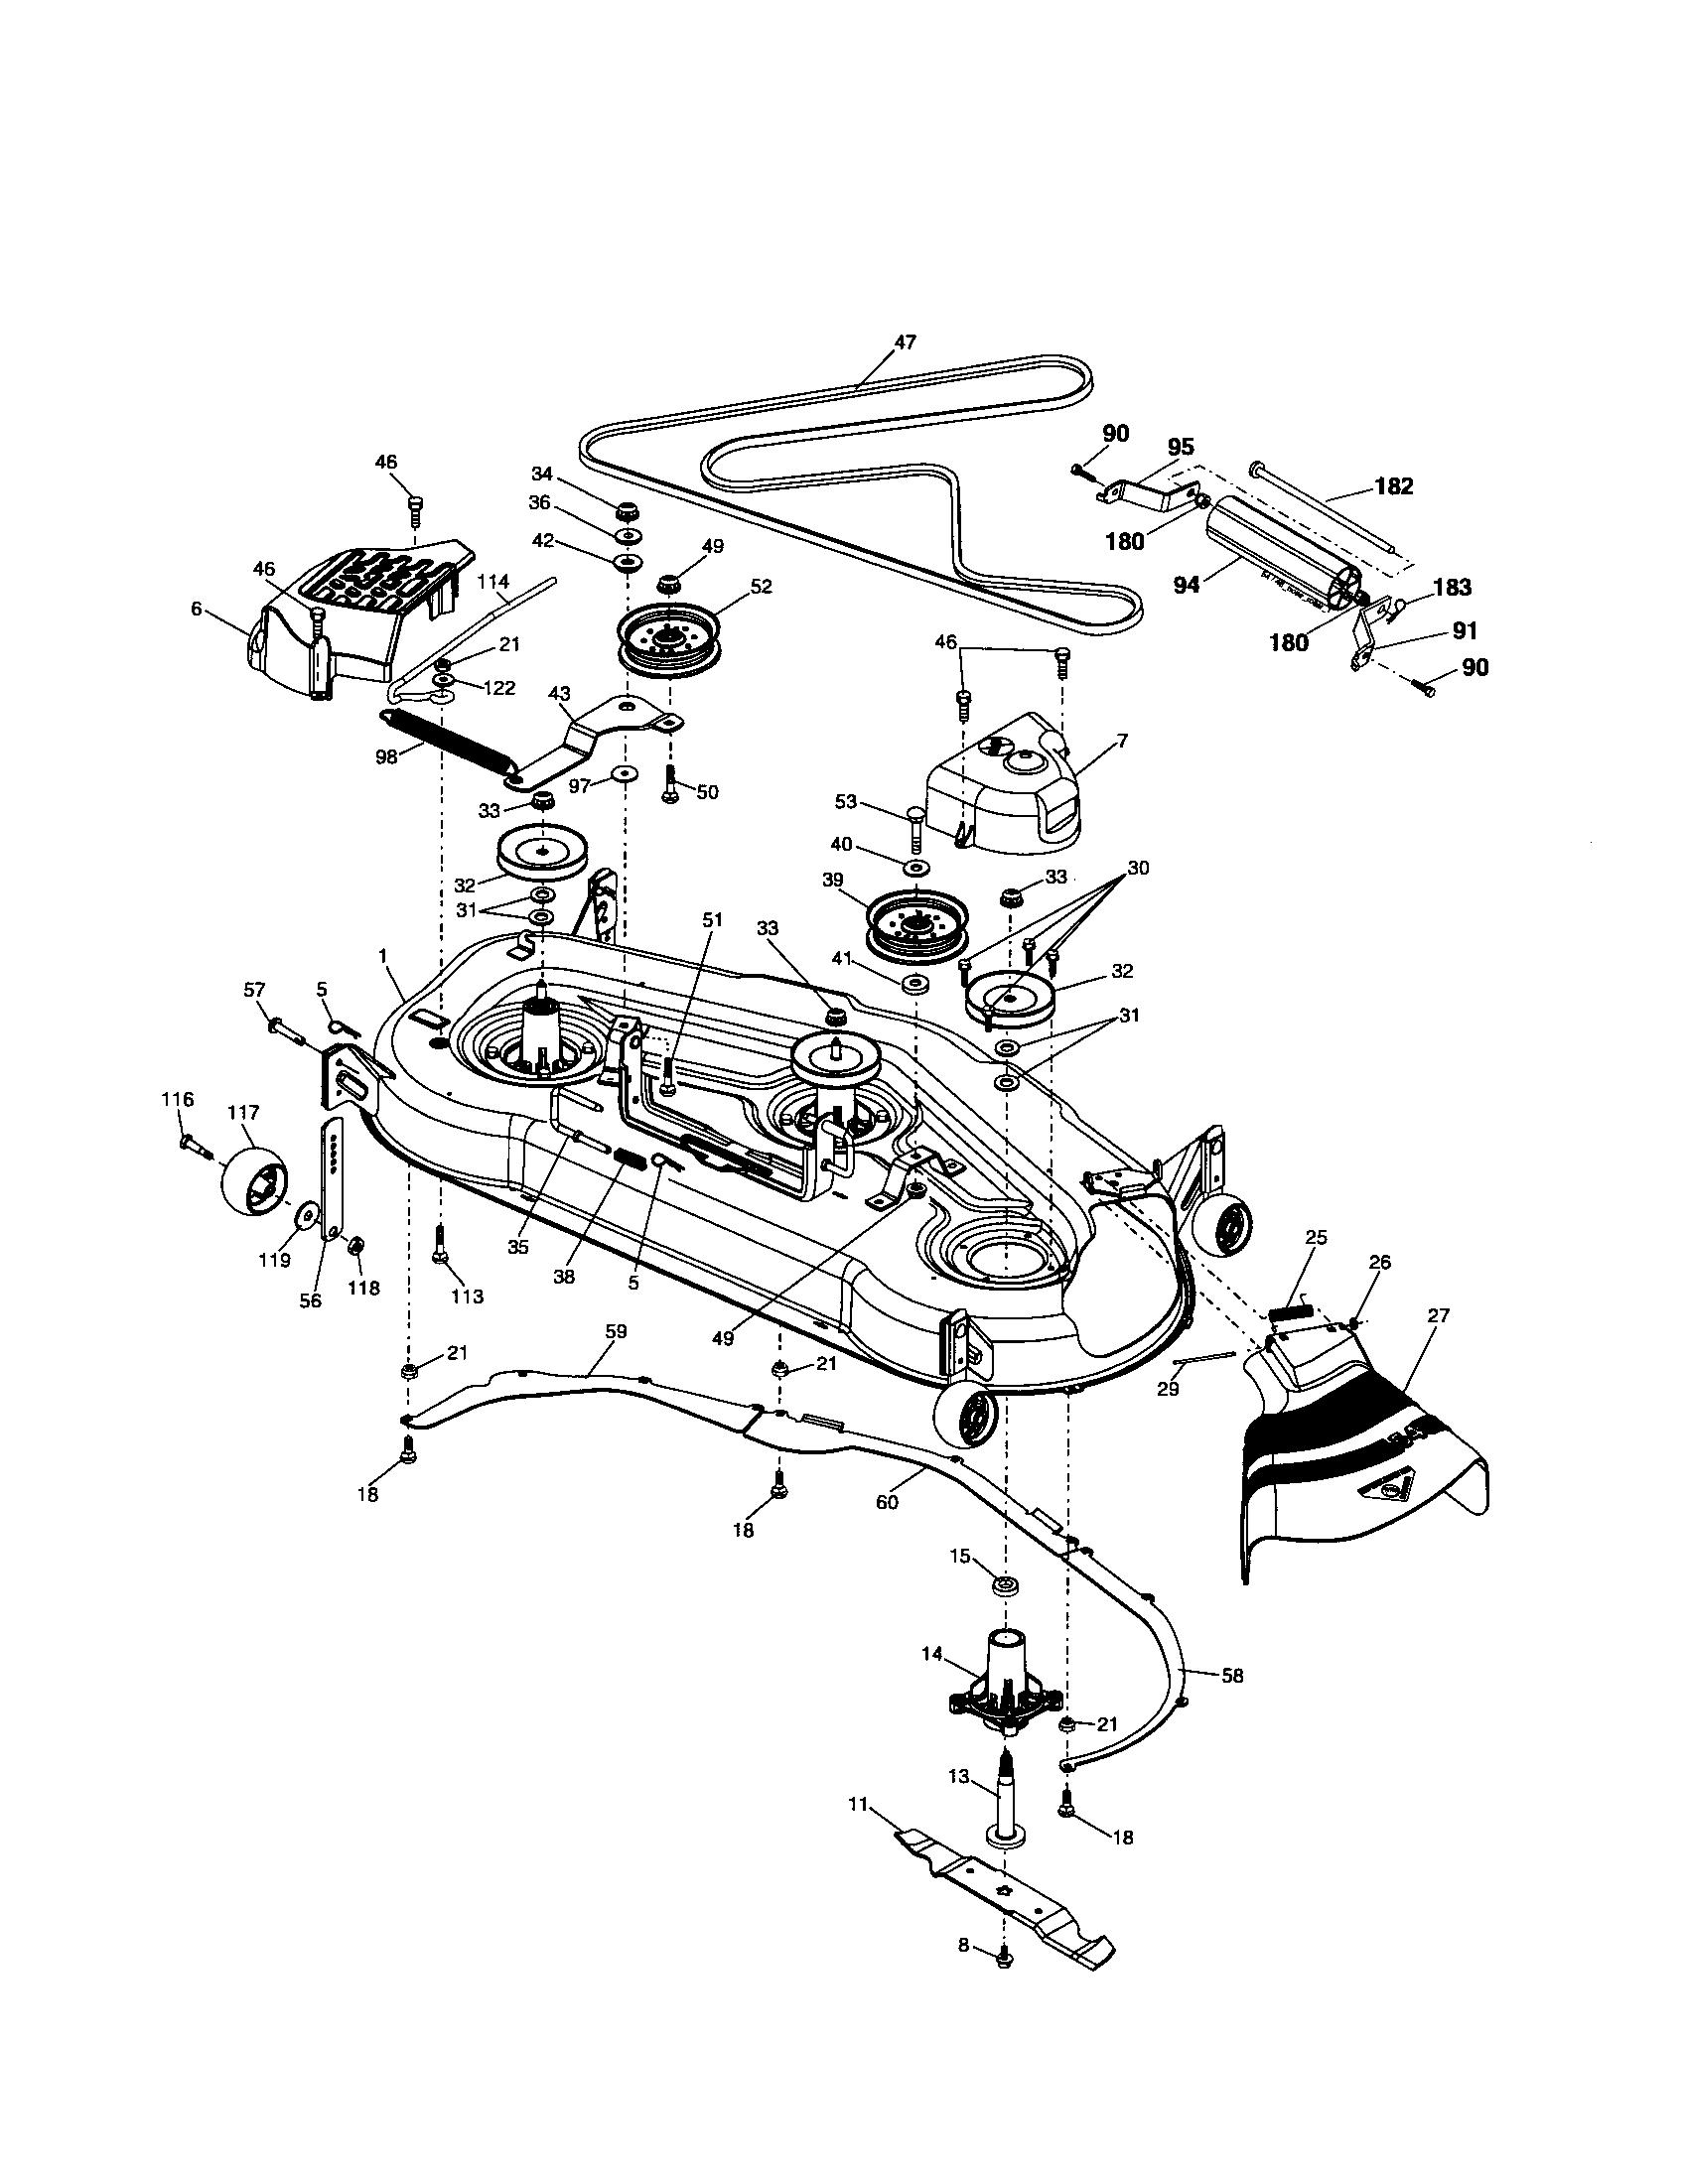 Rz 5424 Wiring Diagram For Husqvarna Lawn Tractor Rz5424 Schematic Diagrams Libraryhusqvarna Mower Parts Manual Carnmotors Com